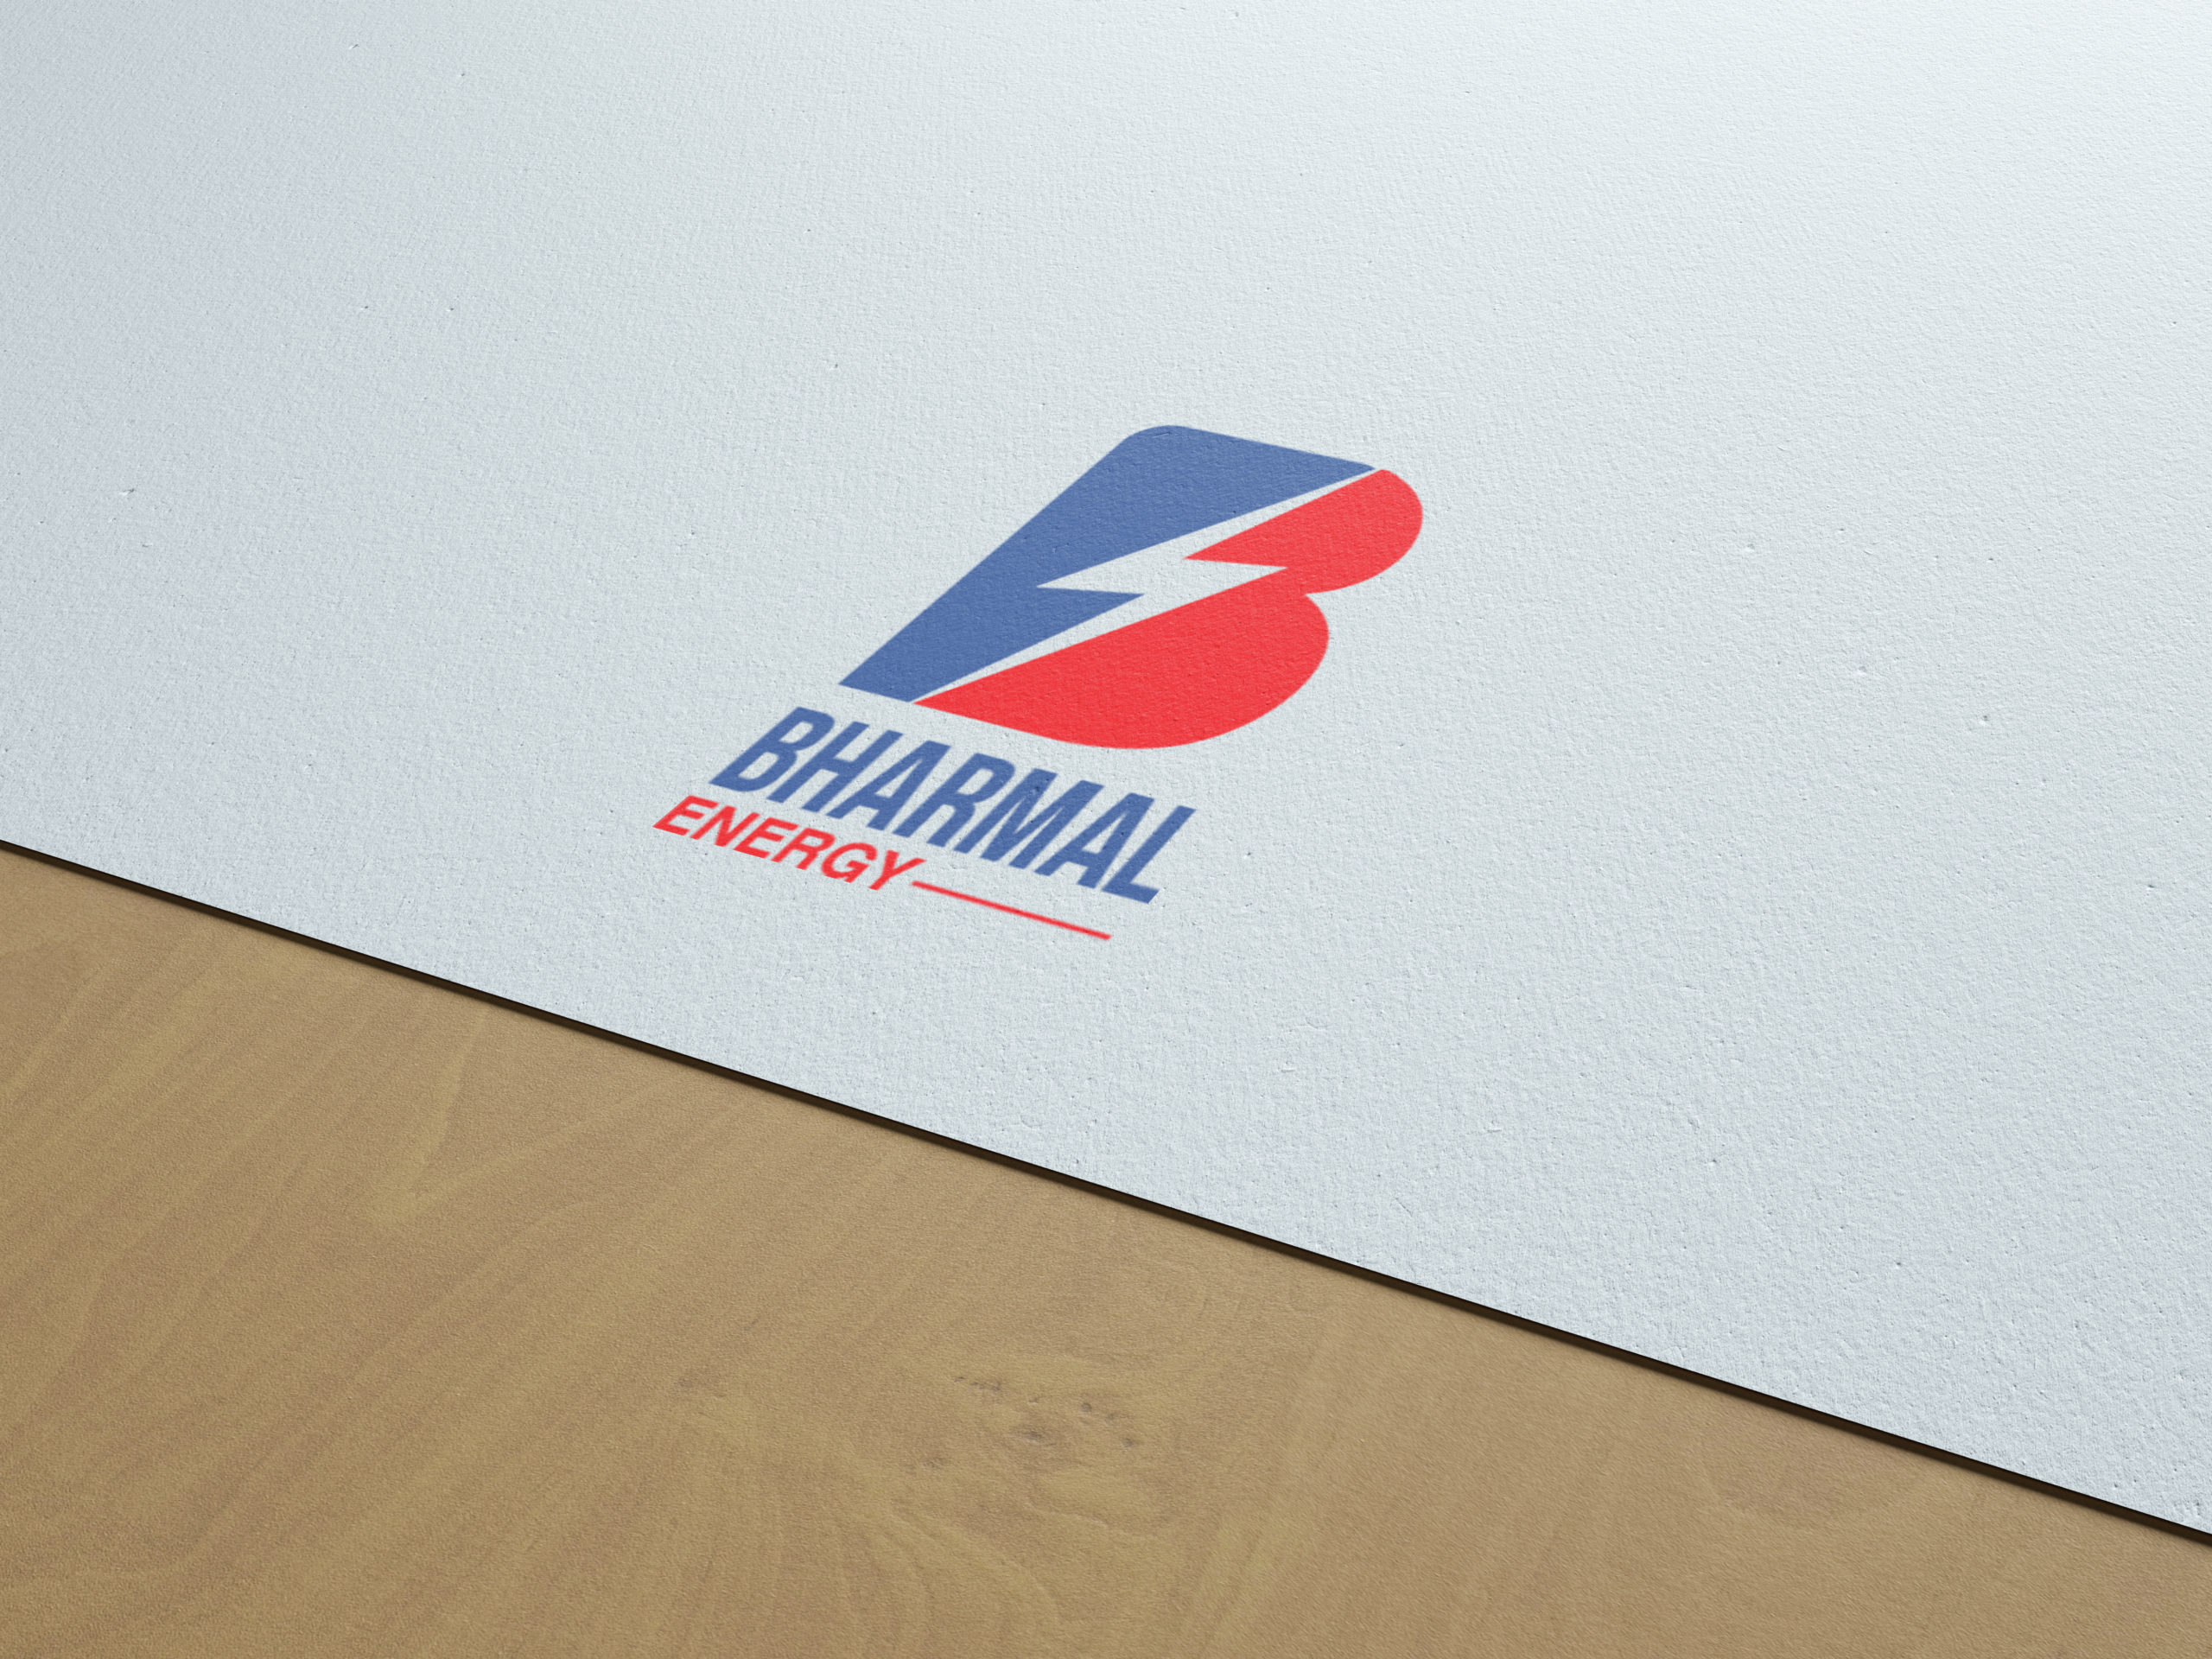 Bharmal energy solar company logo design by Badri Design